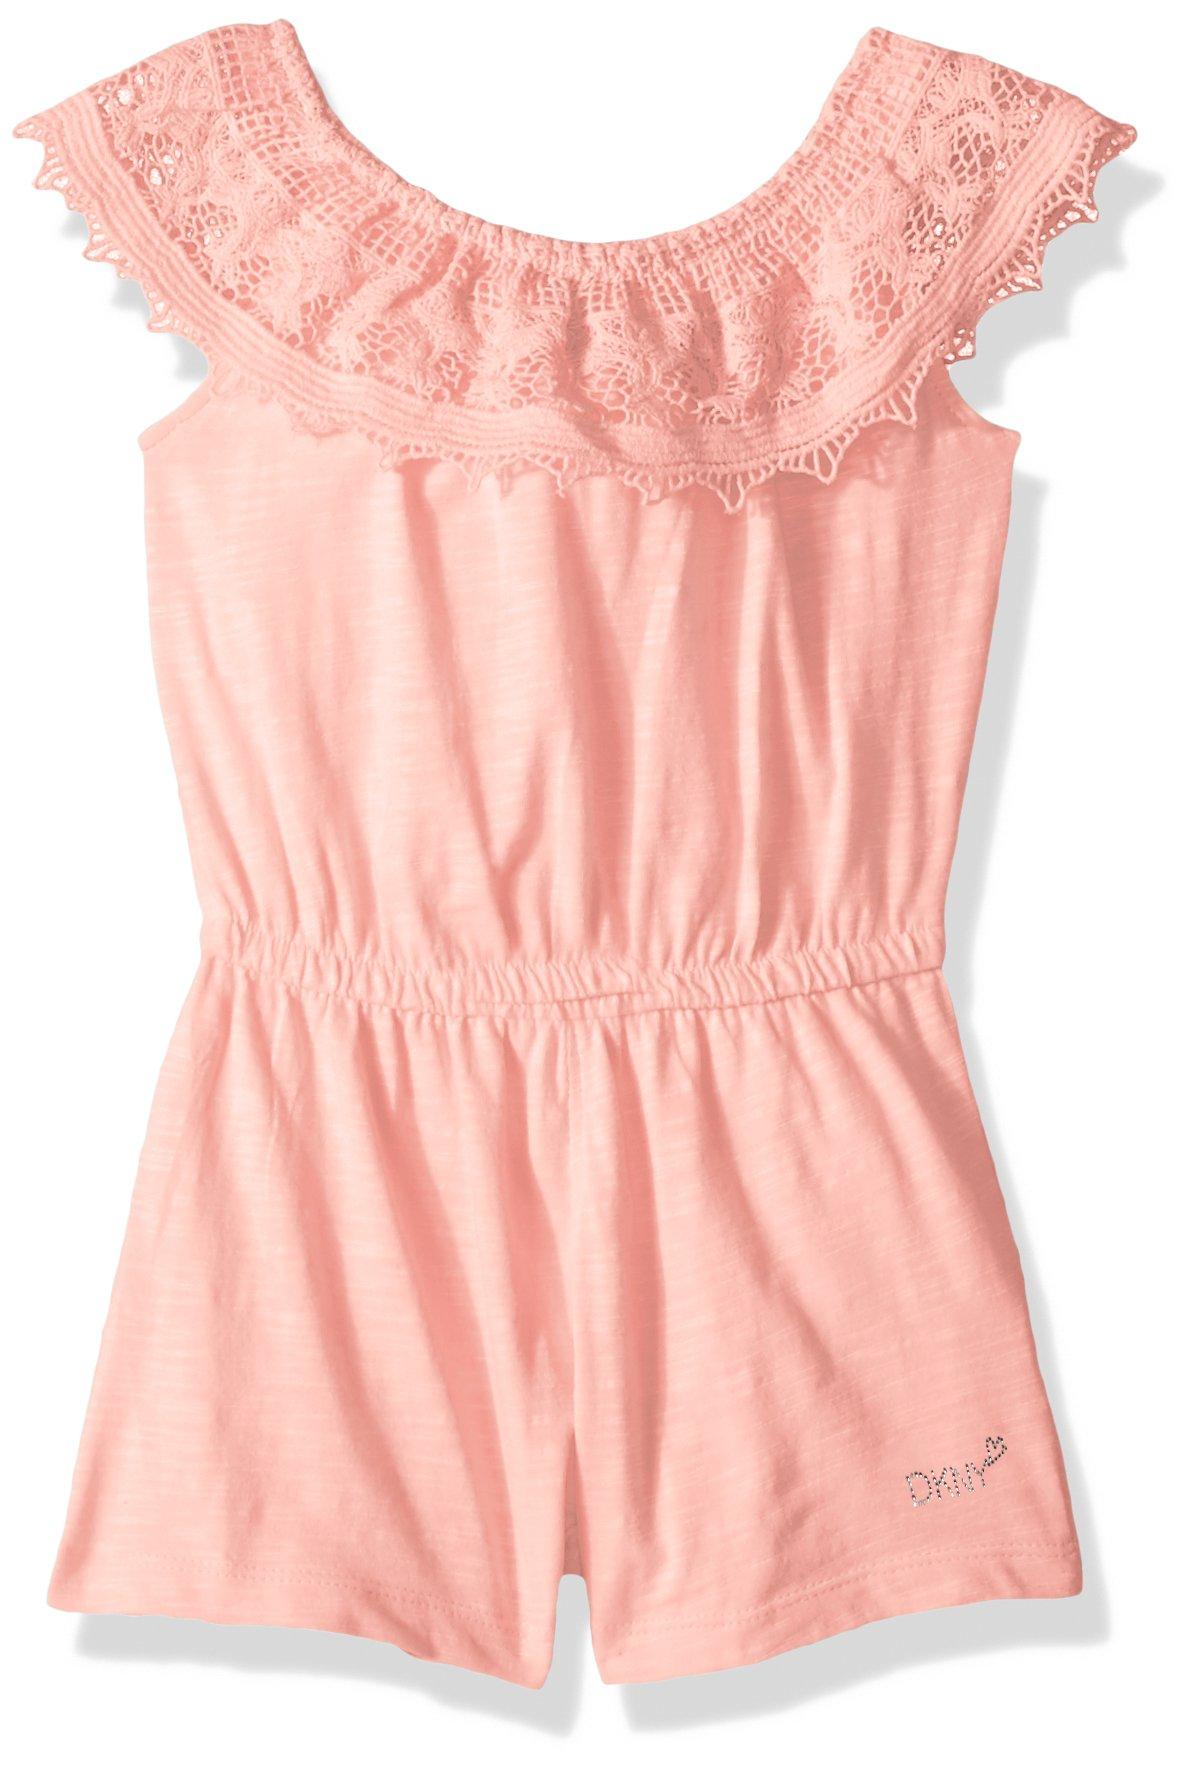 DKNY Big Girls' Romper, Knit Crochet Ruffle Crystal Rose, 8